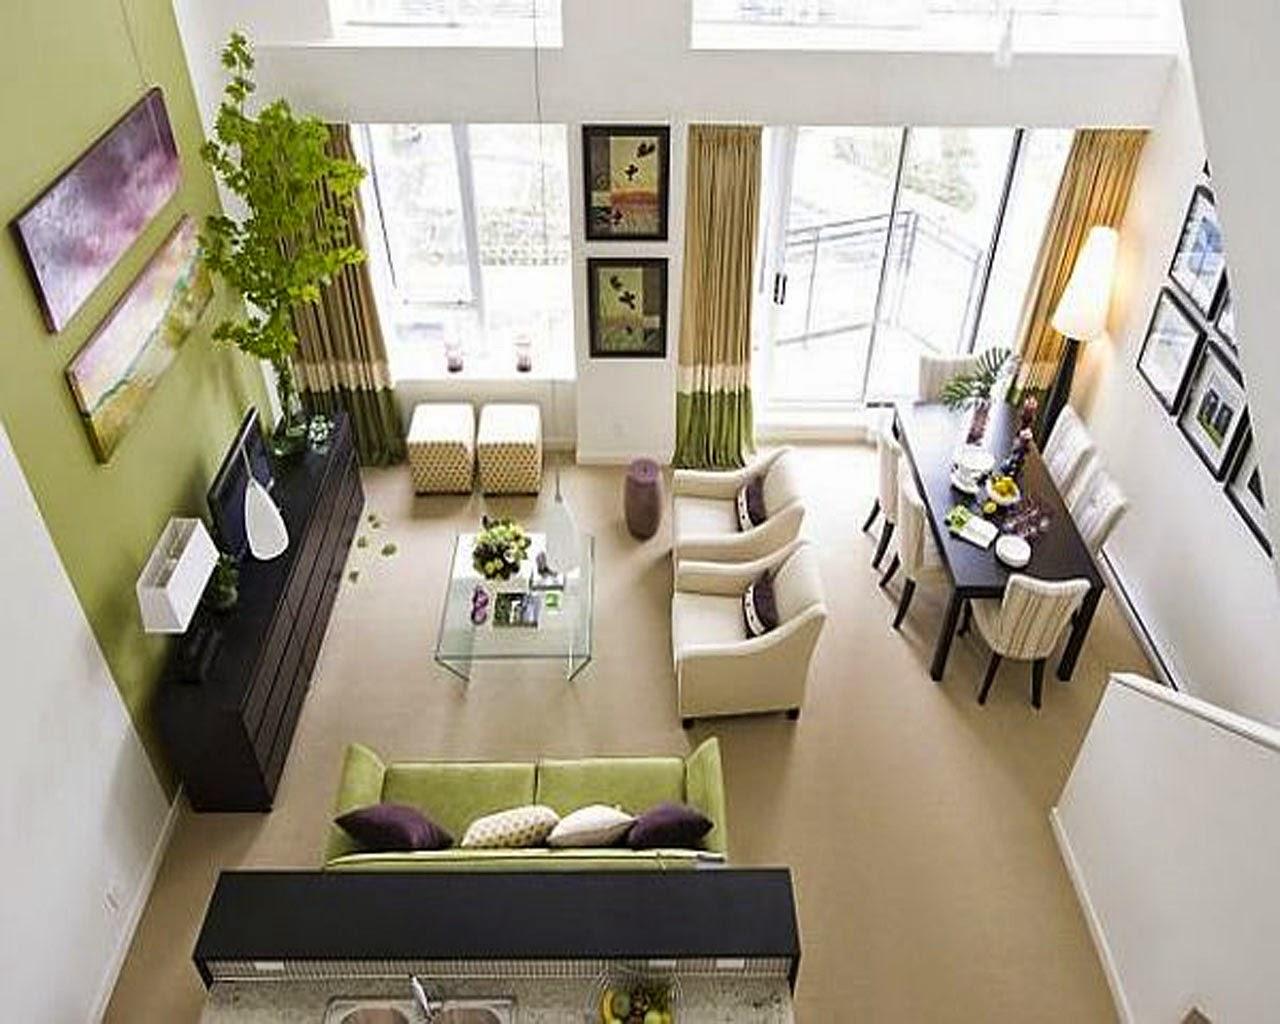 Jika Untuk Ruang Tamu Yang Besar Sofa Jenis L Shape Sesuai Digunakan Dan Digandingkan Dengan Lounge Chair Bagi Menyerikan Suasana